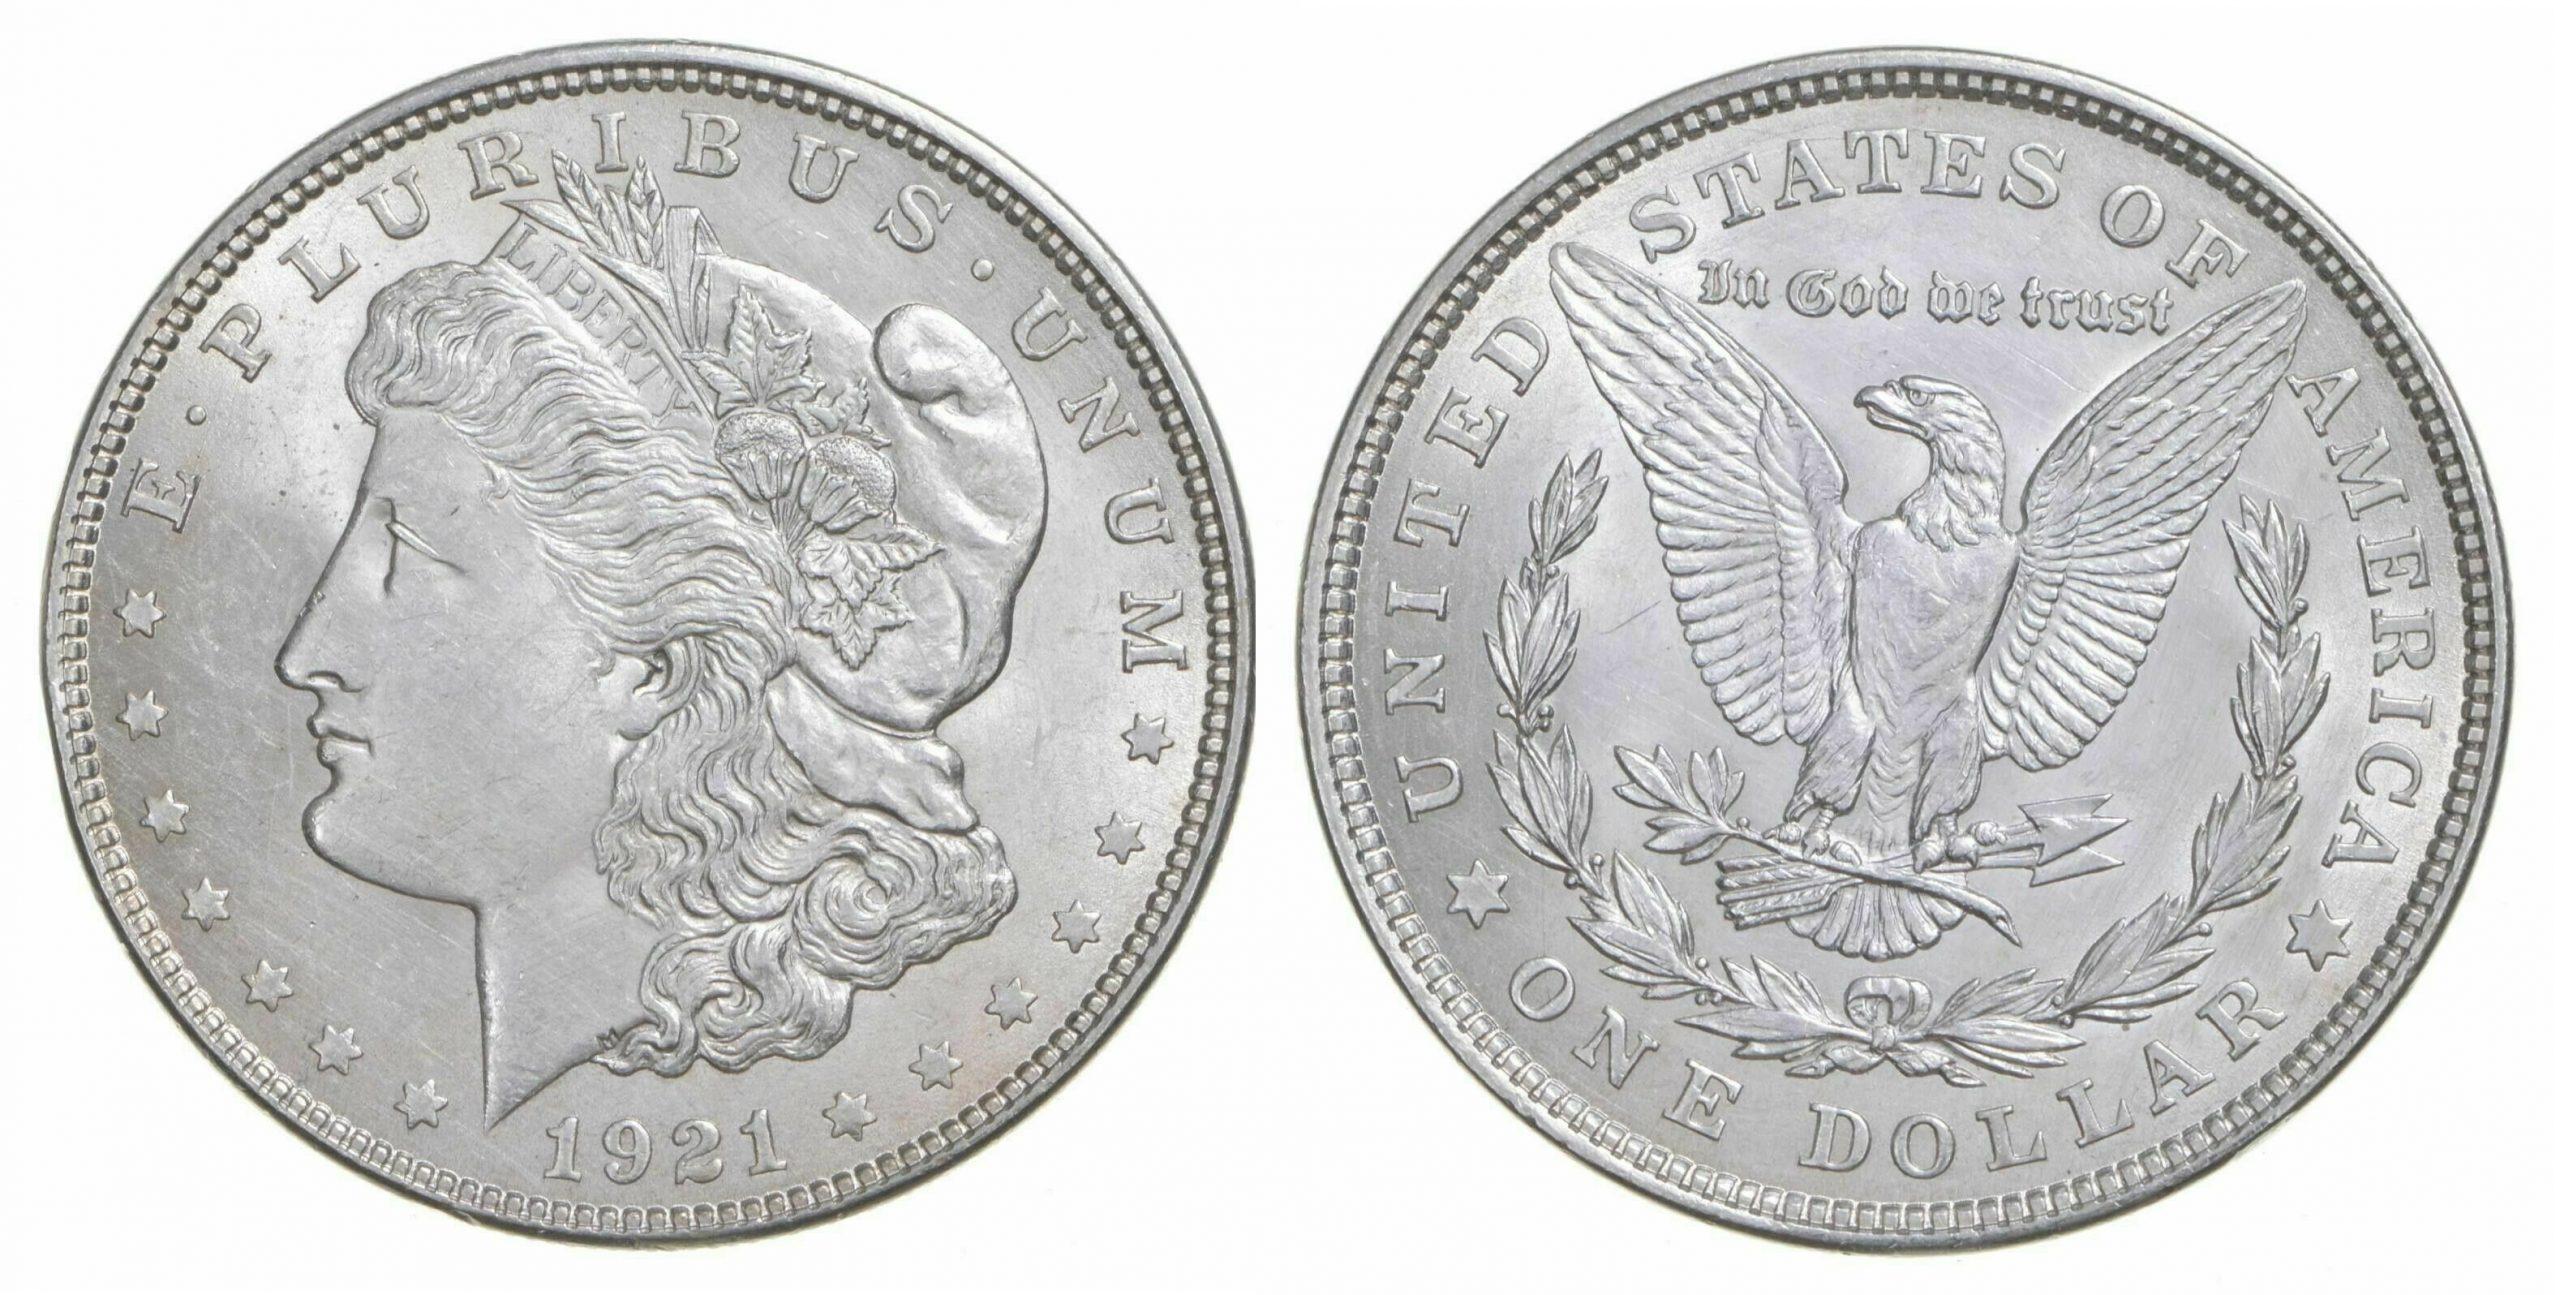 1921_Morgan_Silver_Dollars_AU - coin shop in lutz